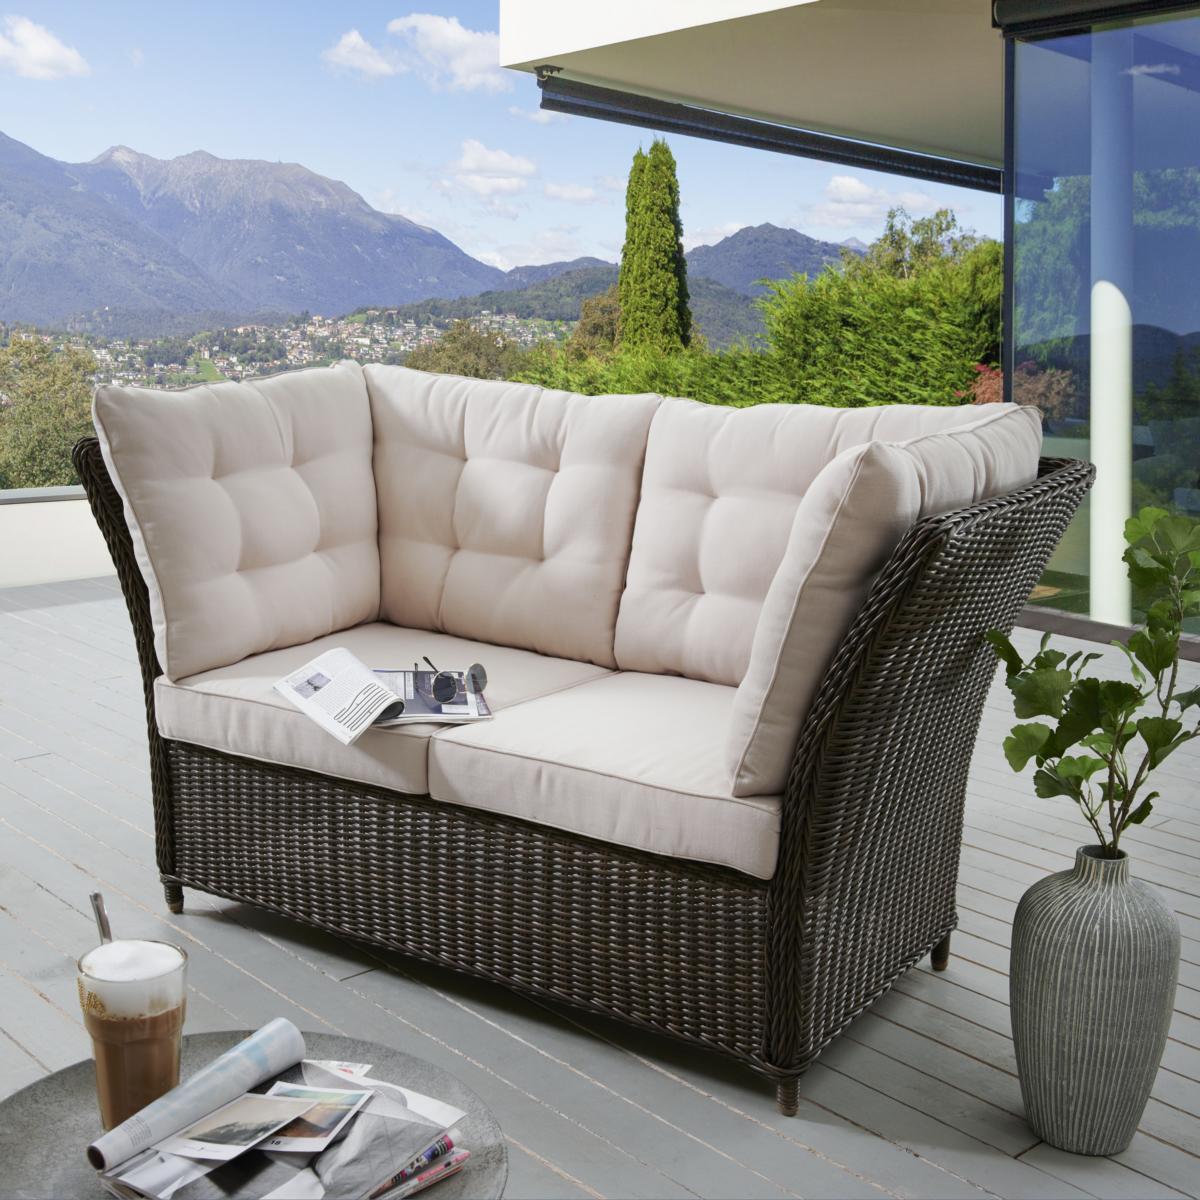 Gartensofas Haus Garten Onlineshop Loungemobel